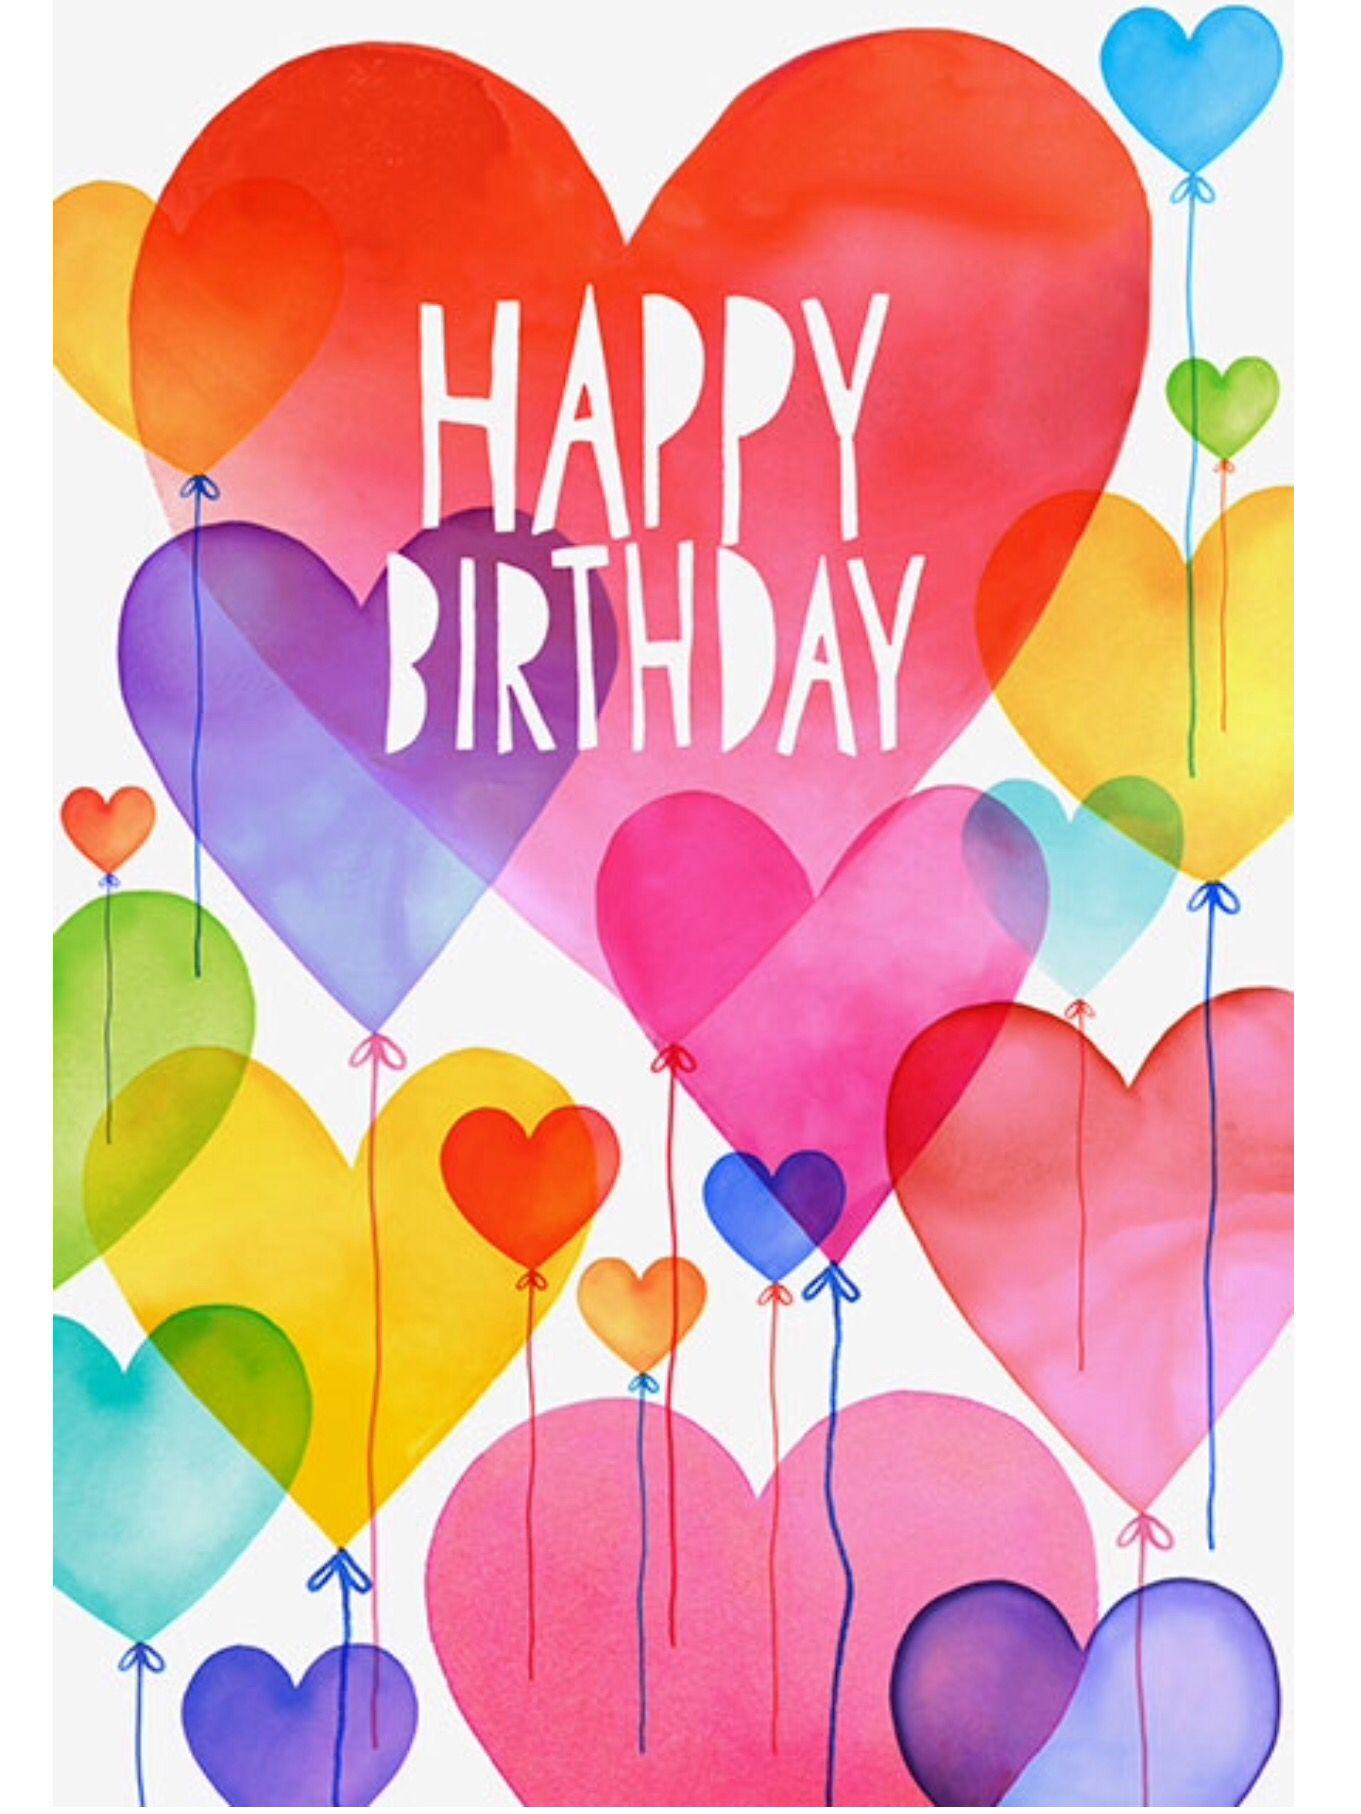 Birthday Happy birthday images, Happy birthday greetings